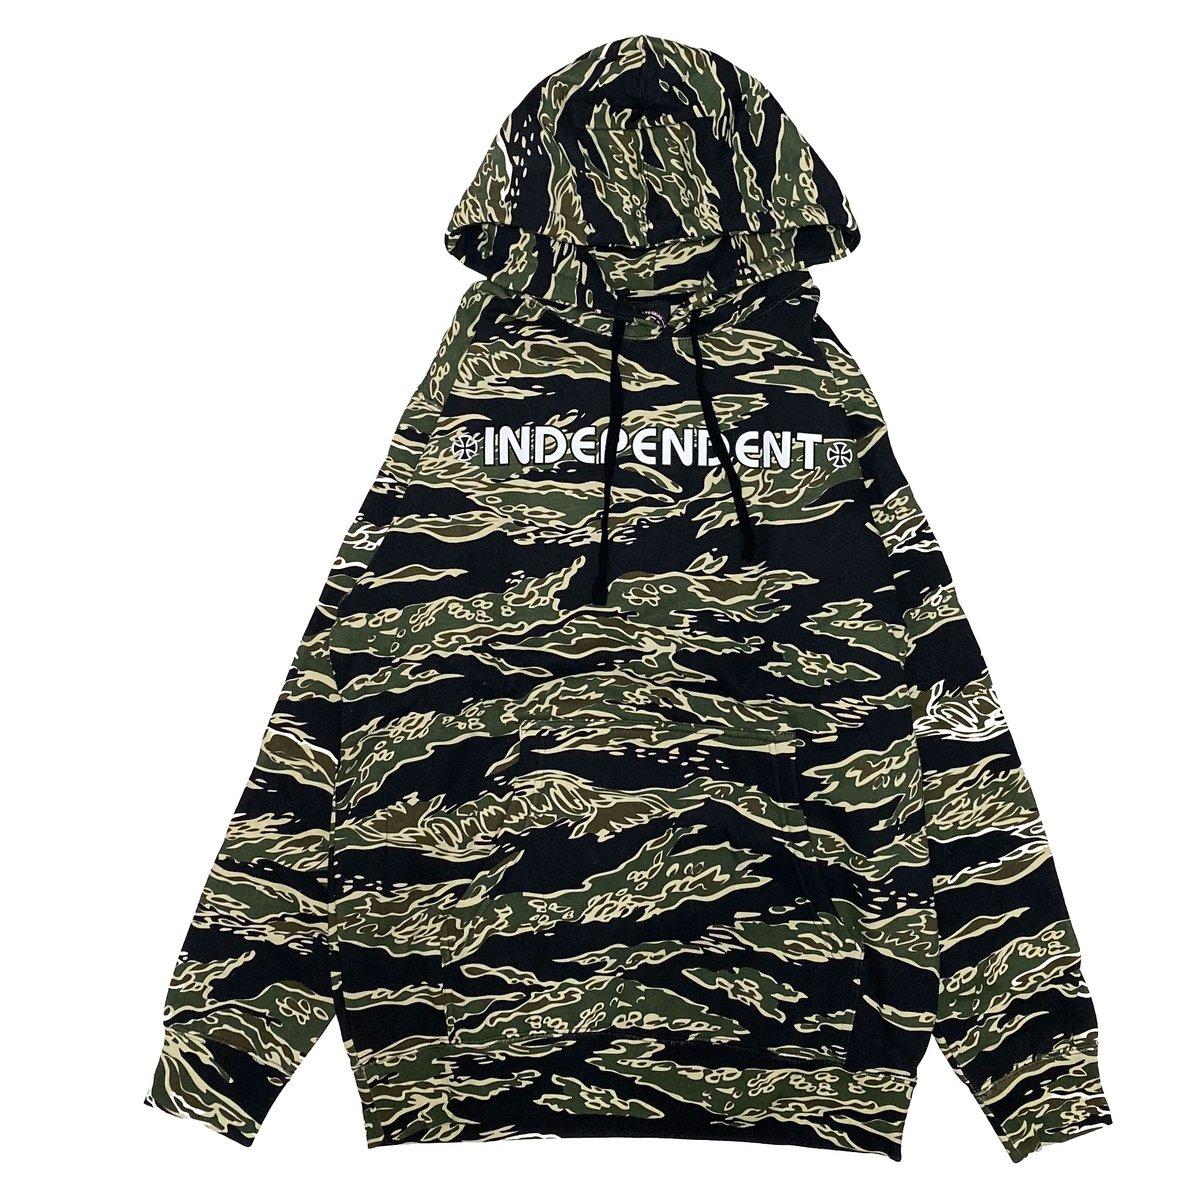 INDEPENDENTより商品が入荷しました。   #phorgun #independent #indy #hoodie #parka #パーカー #skateboarding #ironcross #tigercamo #タイガーカモ #fashion #渋谷